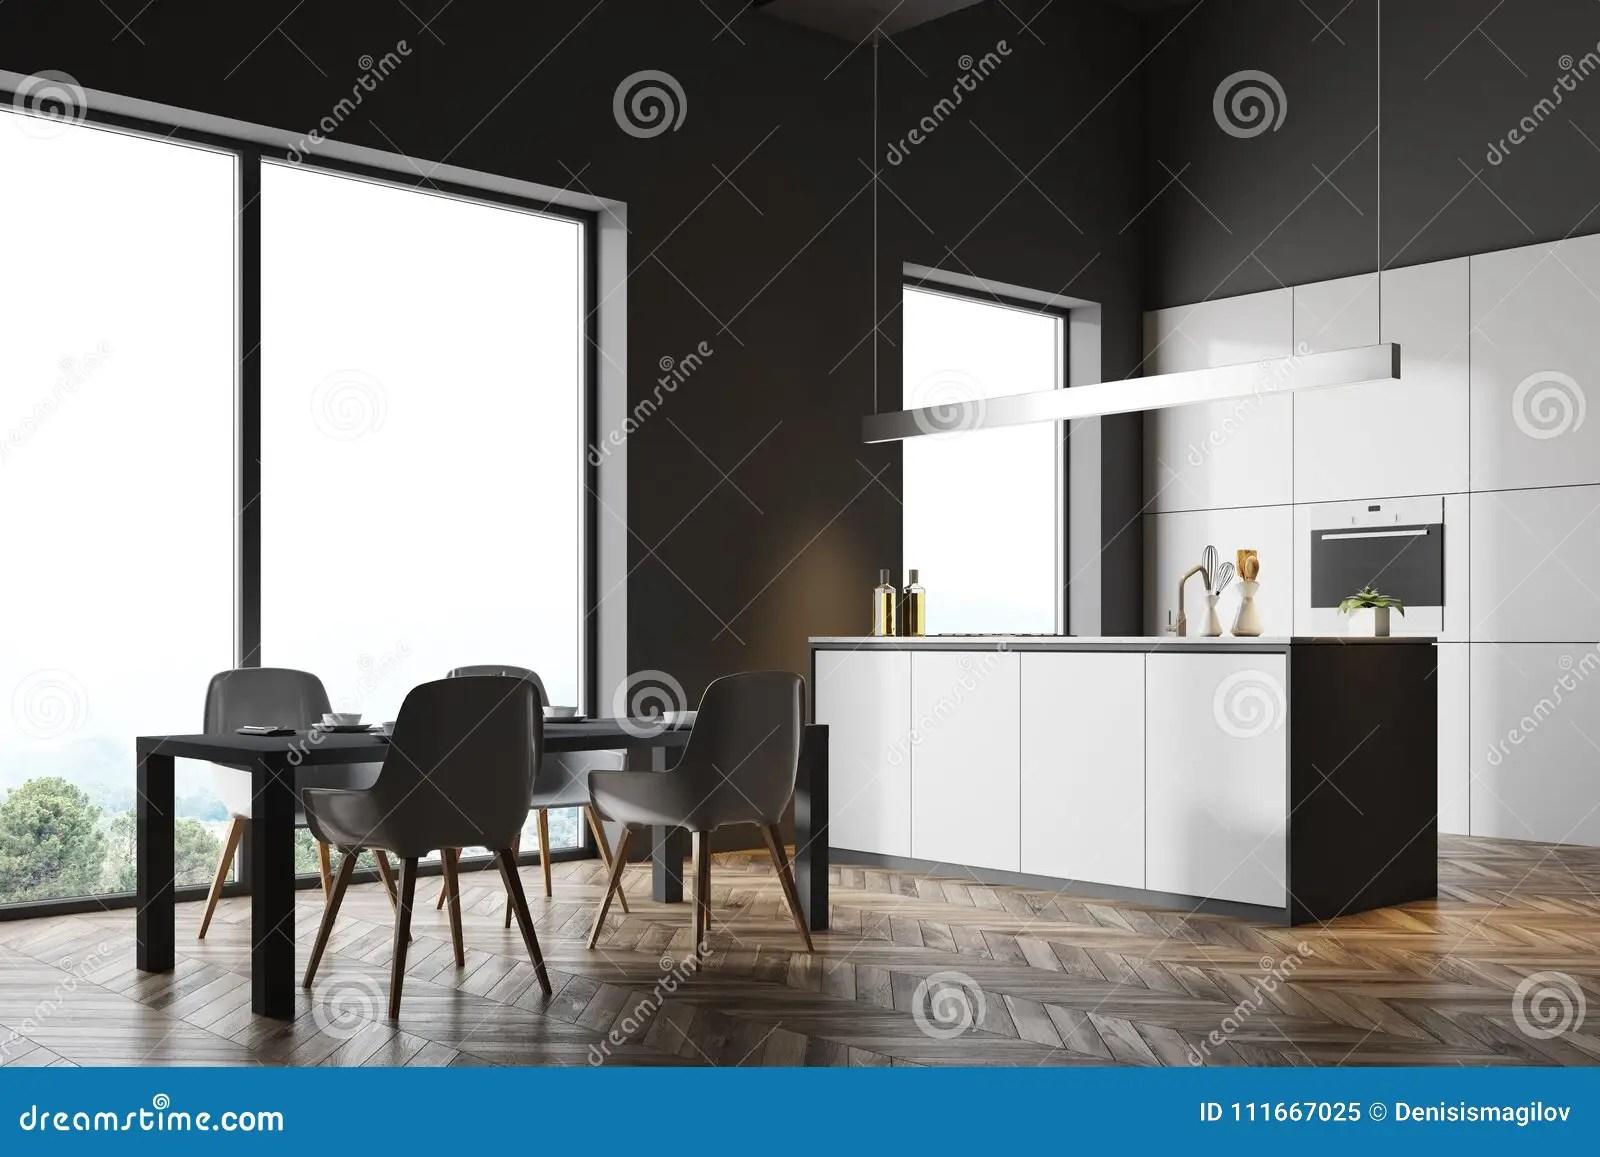 gray kitchen chairs faucet repair parts 深灰厨房角落 灰色桌库存例证 插画包括有椅子 设计 嘲笑 内部 任何 灰色桌